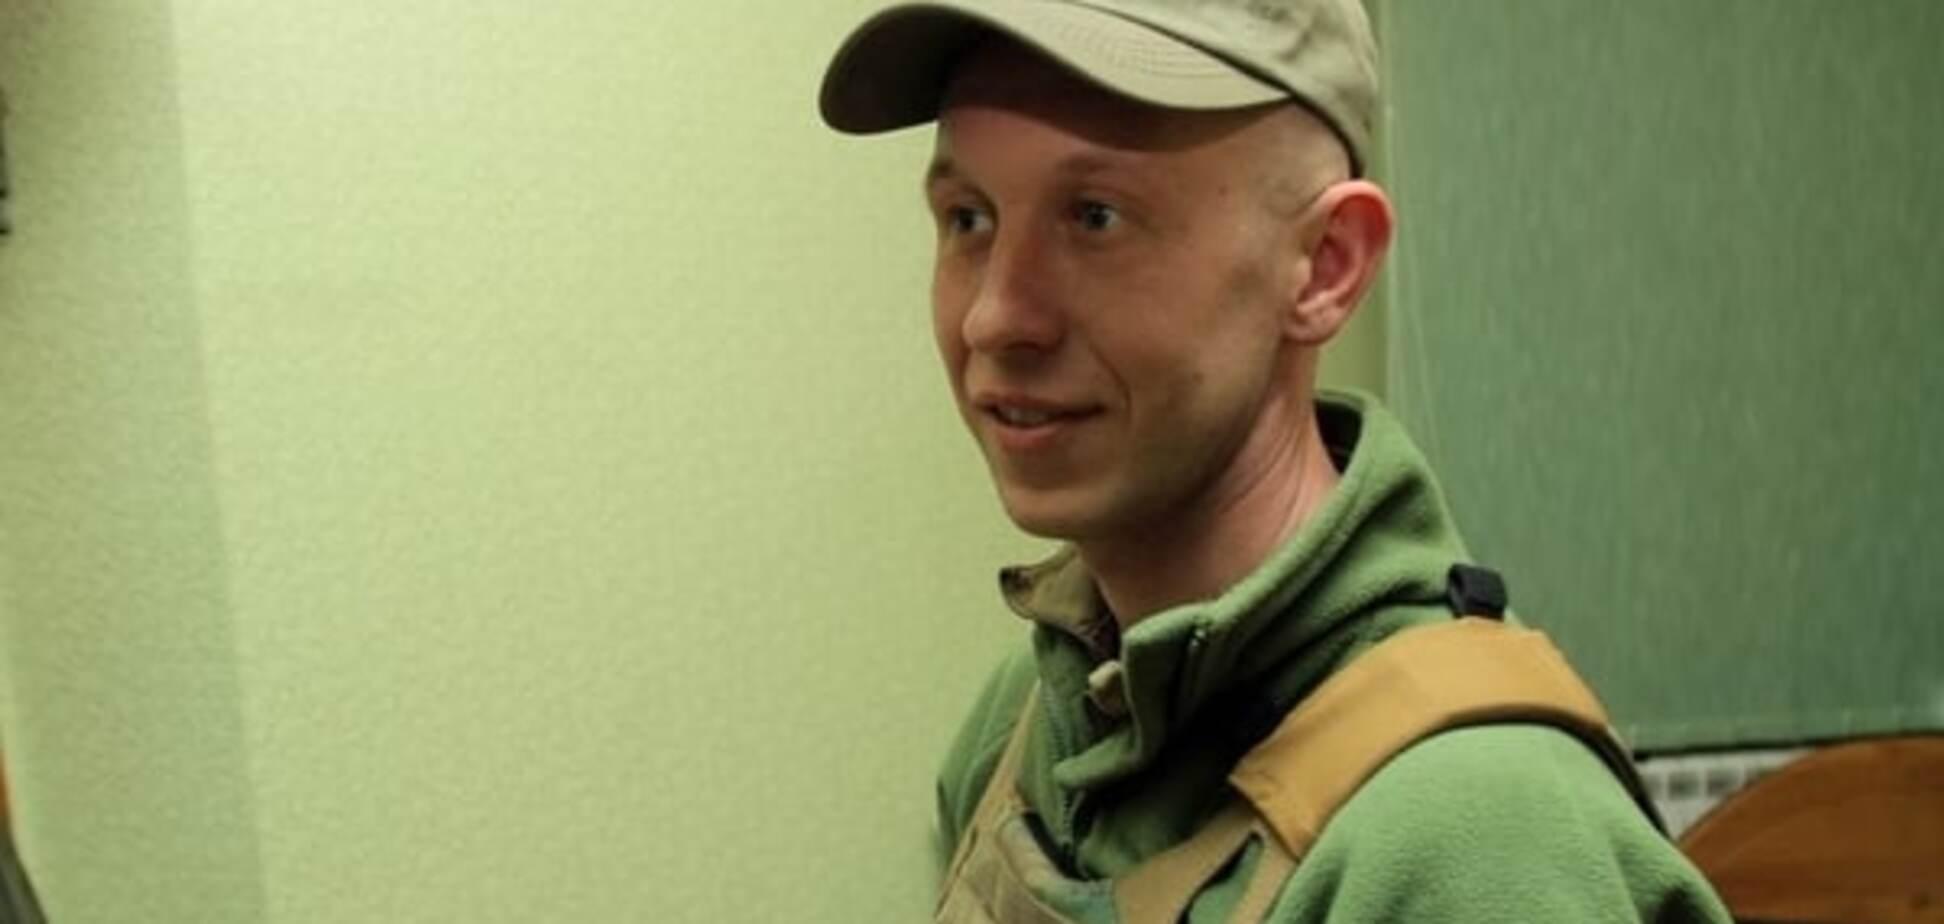 Под Счастьем на фугасе подорвался боец 'Тайфун' - Касьянов